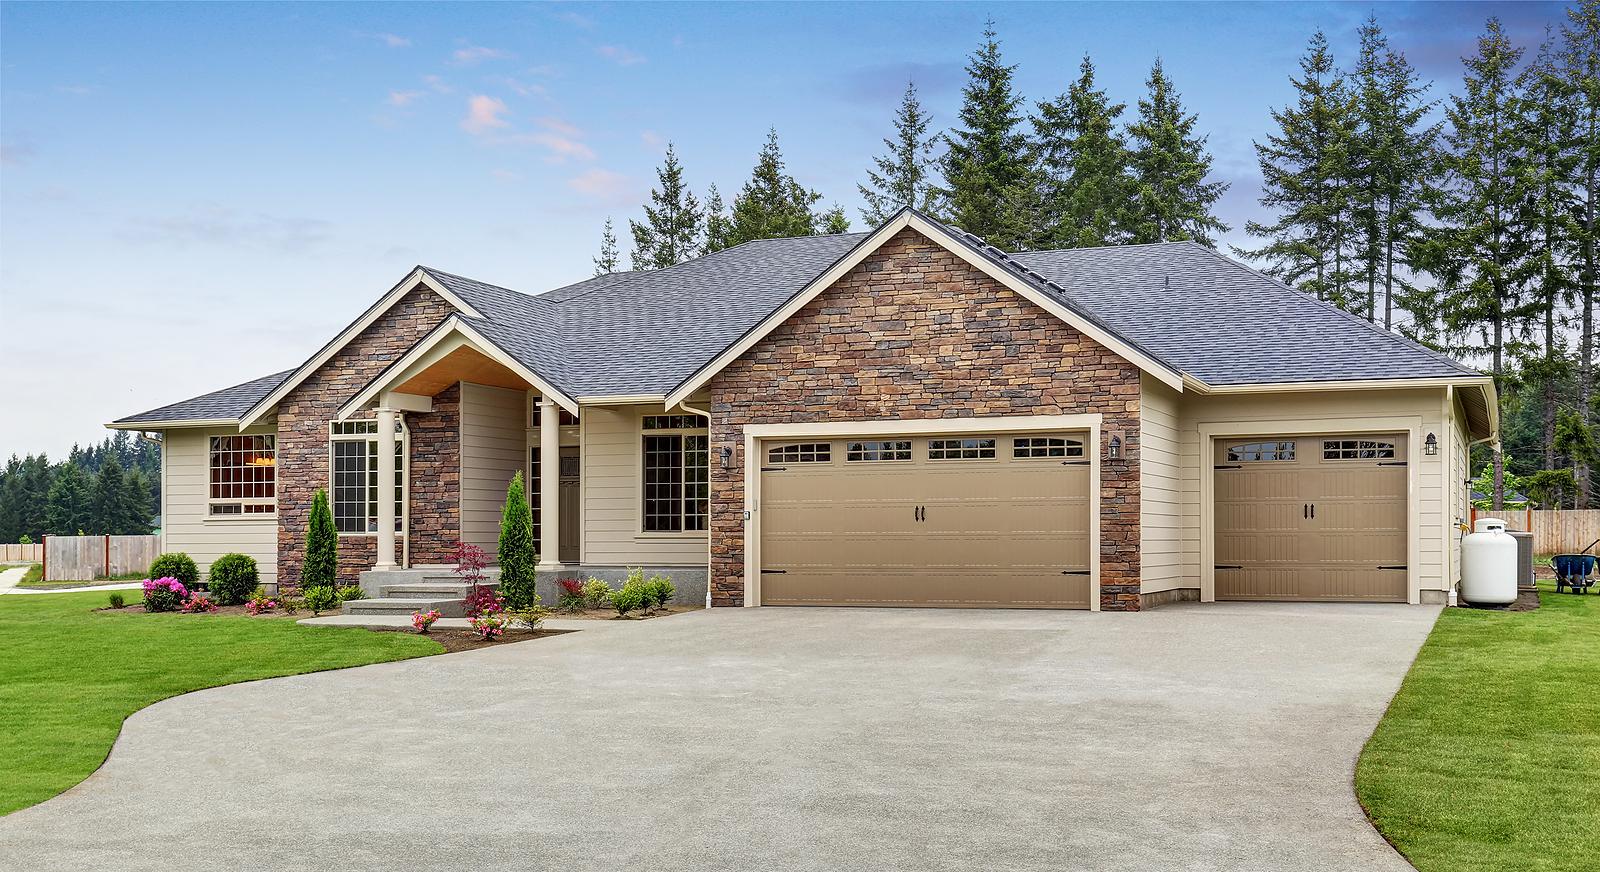 Luxury-One-Level-House-Exterior-with-Brick-Trim-Garage